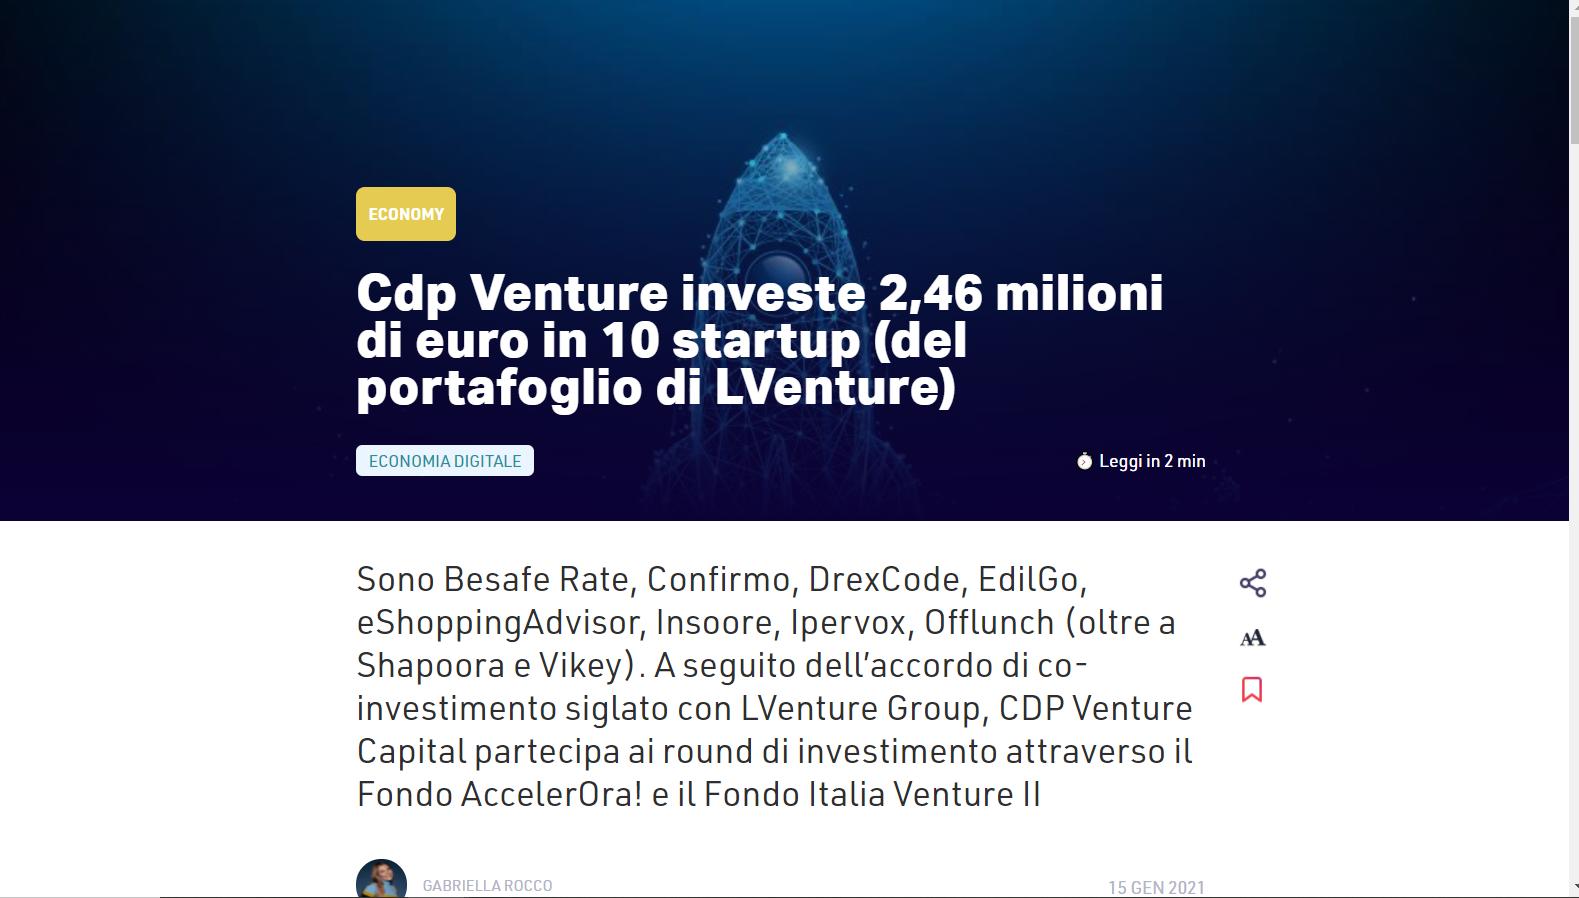 cdp venture